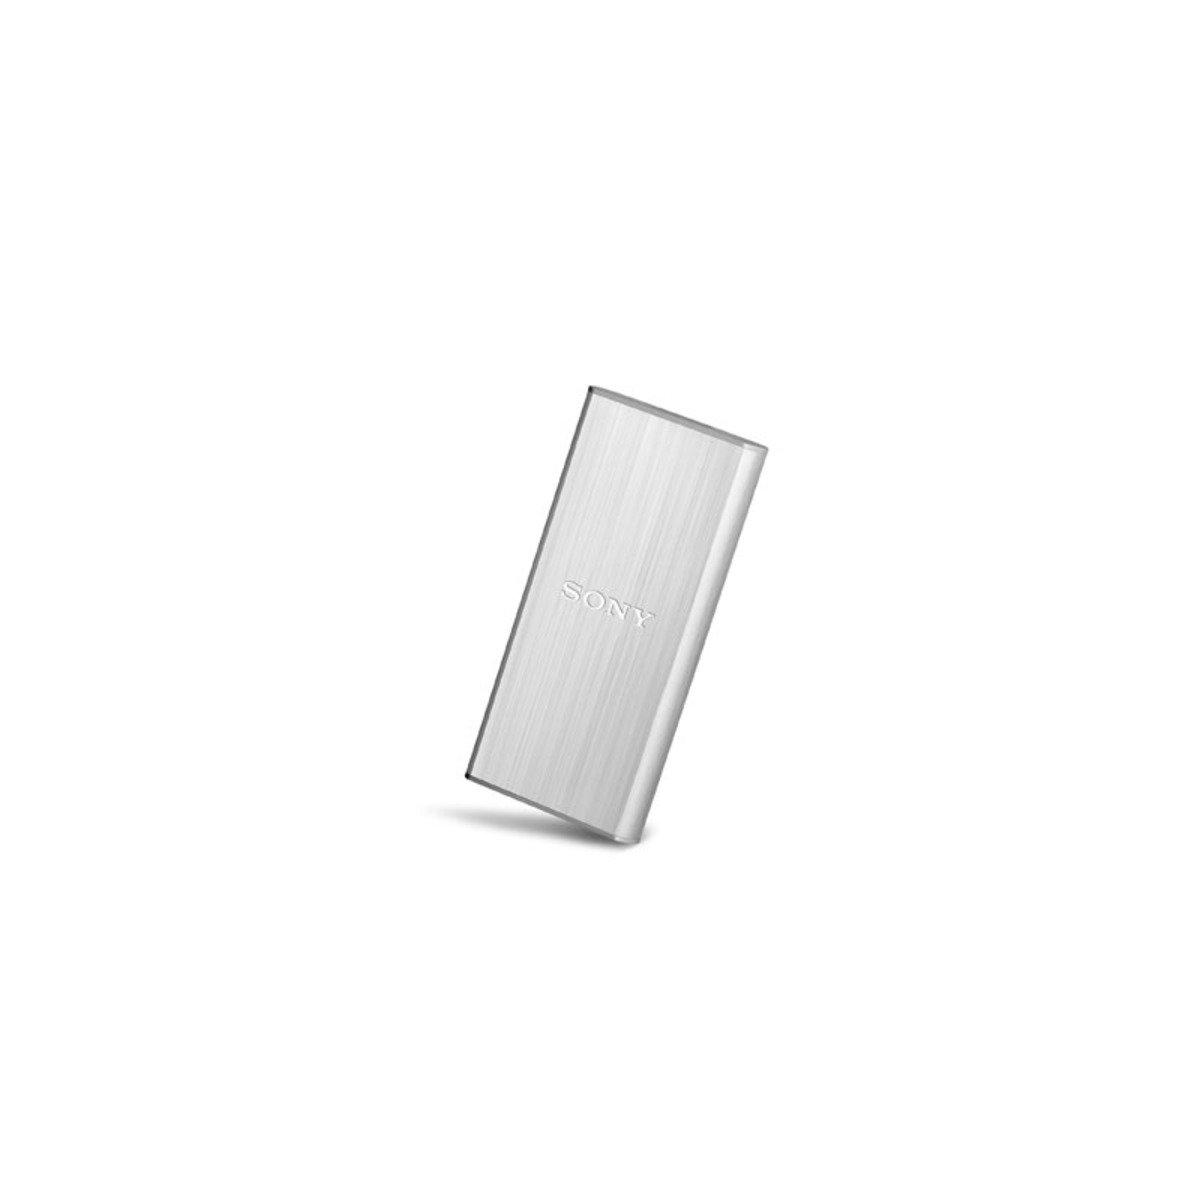 SSD 高速外置USB3.0 固態硬碟 128GB SL-BG2/SC